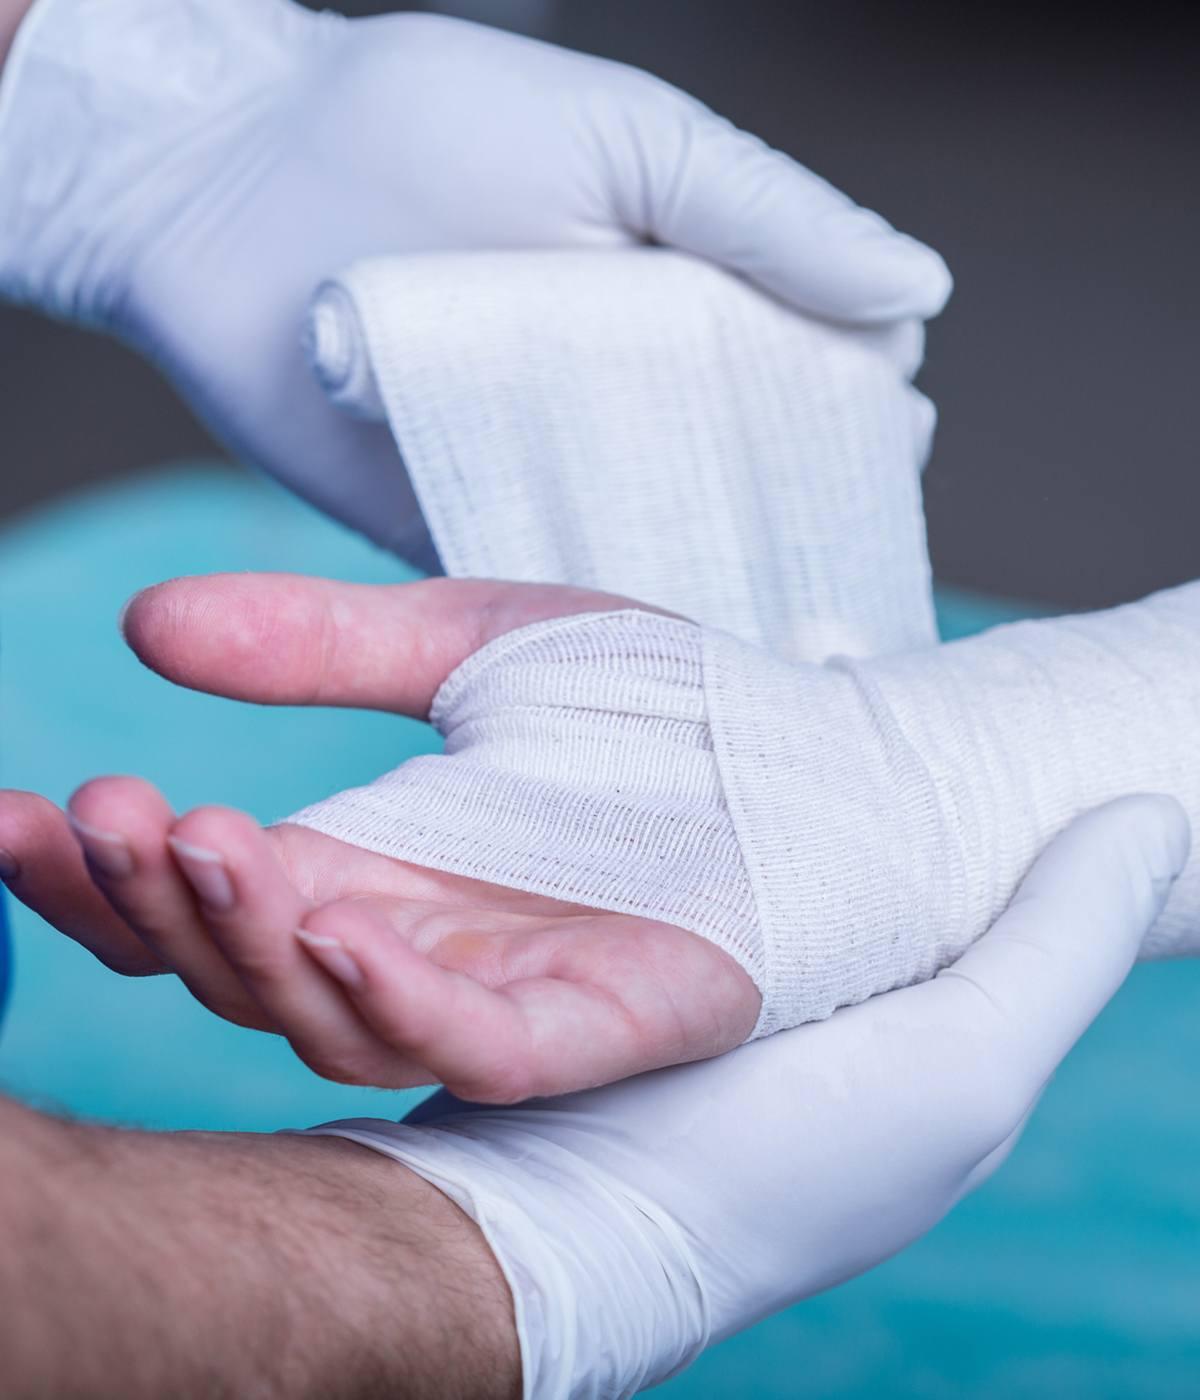 Doctor Bandaging Wrist Fracture